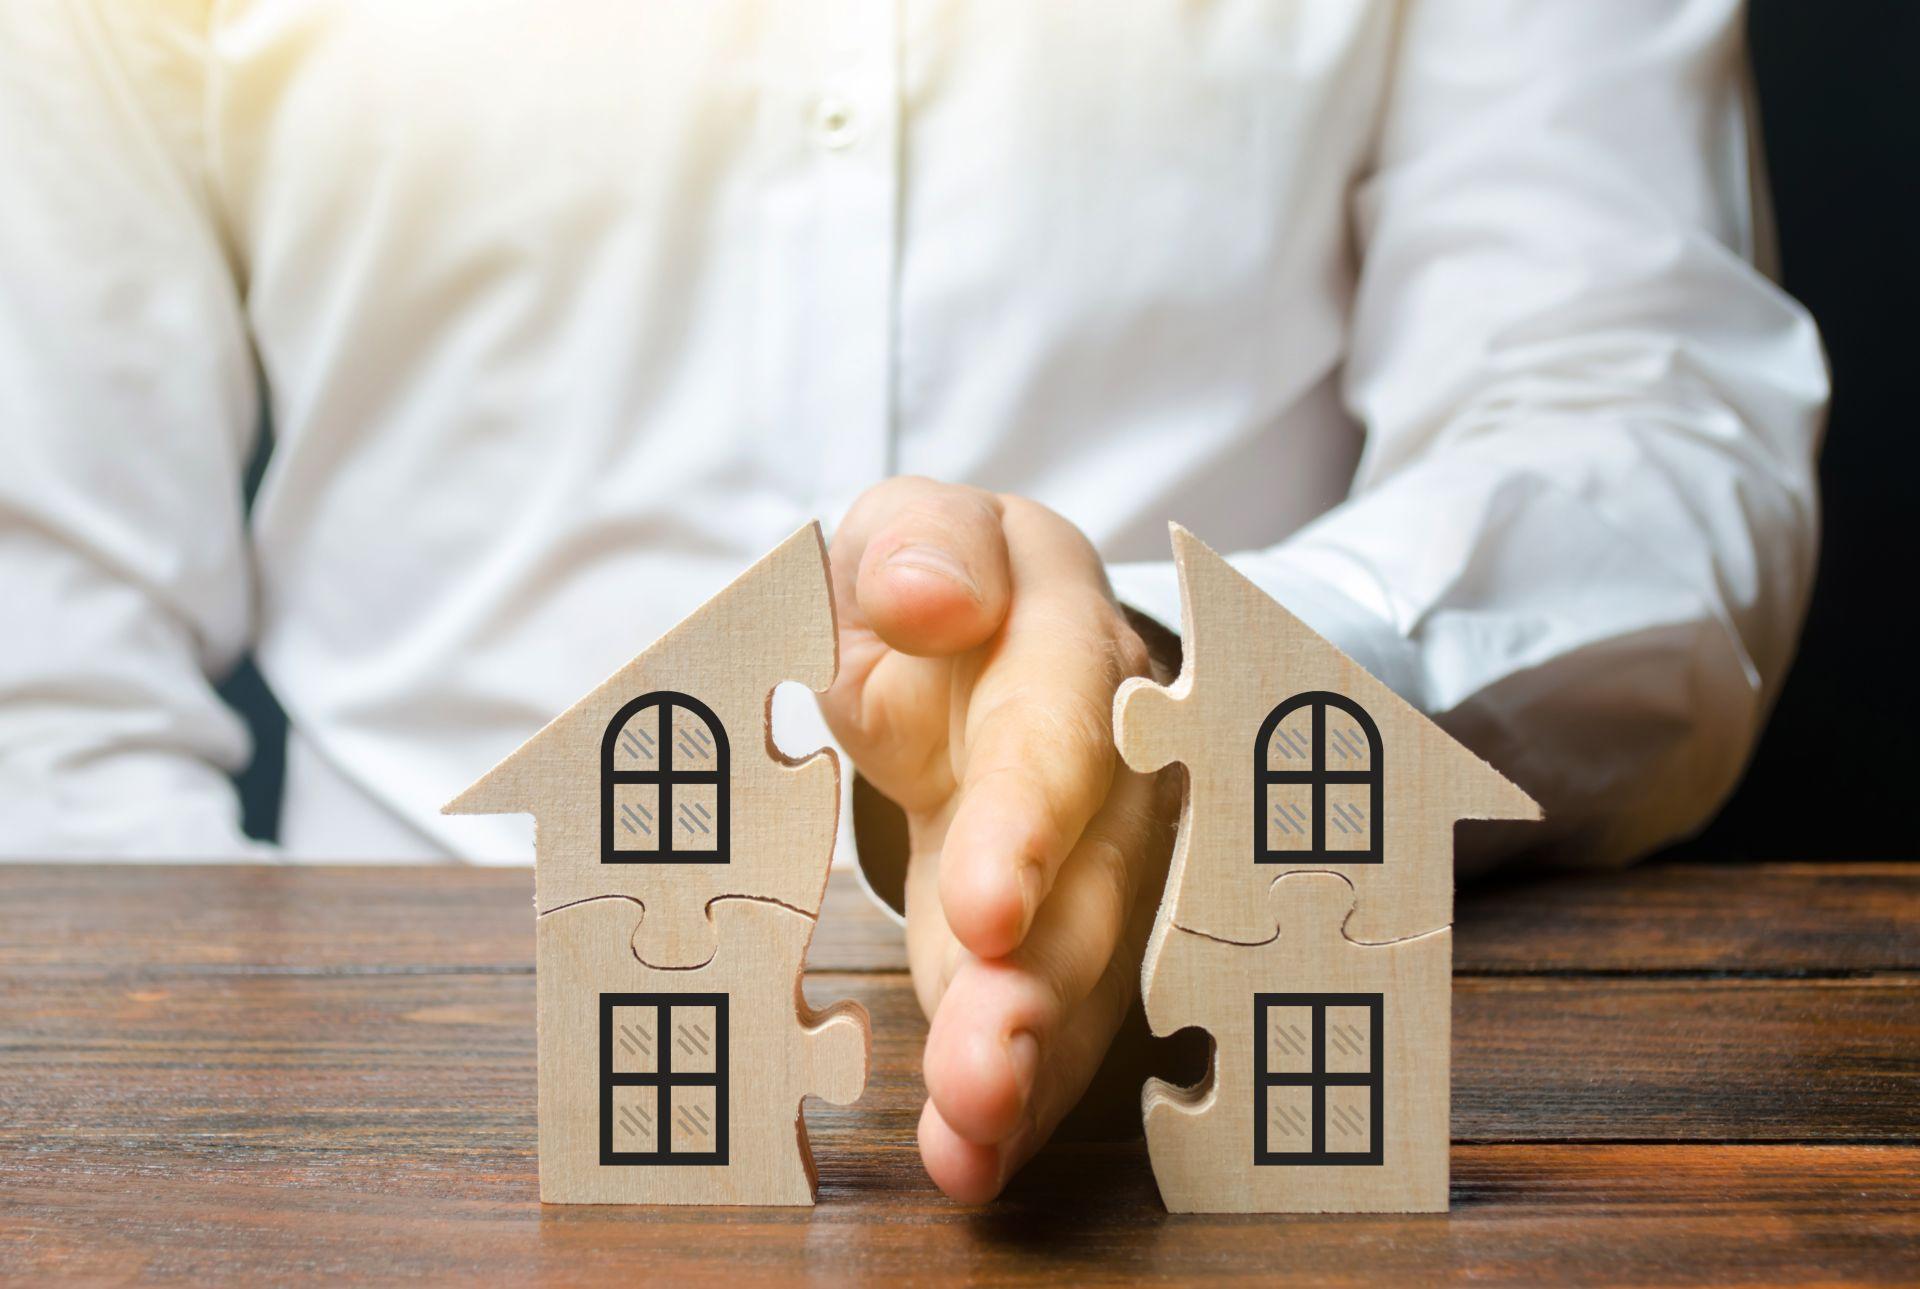 Dividing Real Property in Divorce